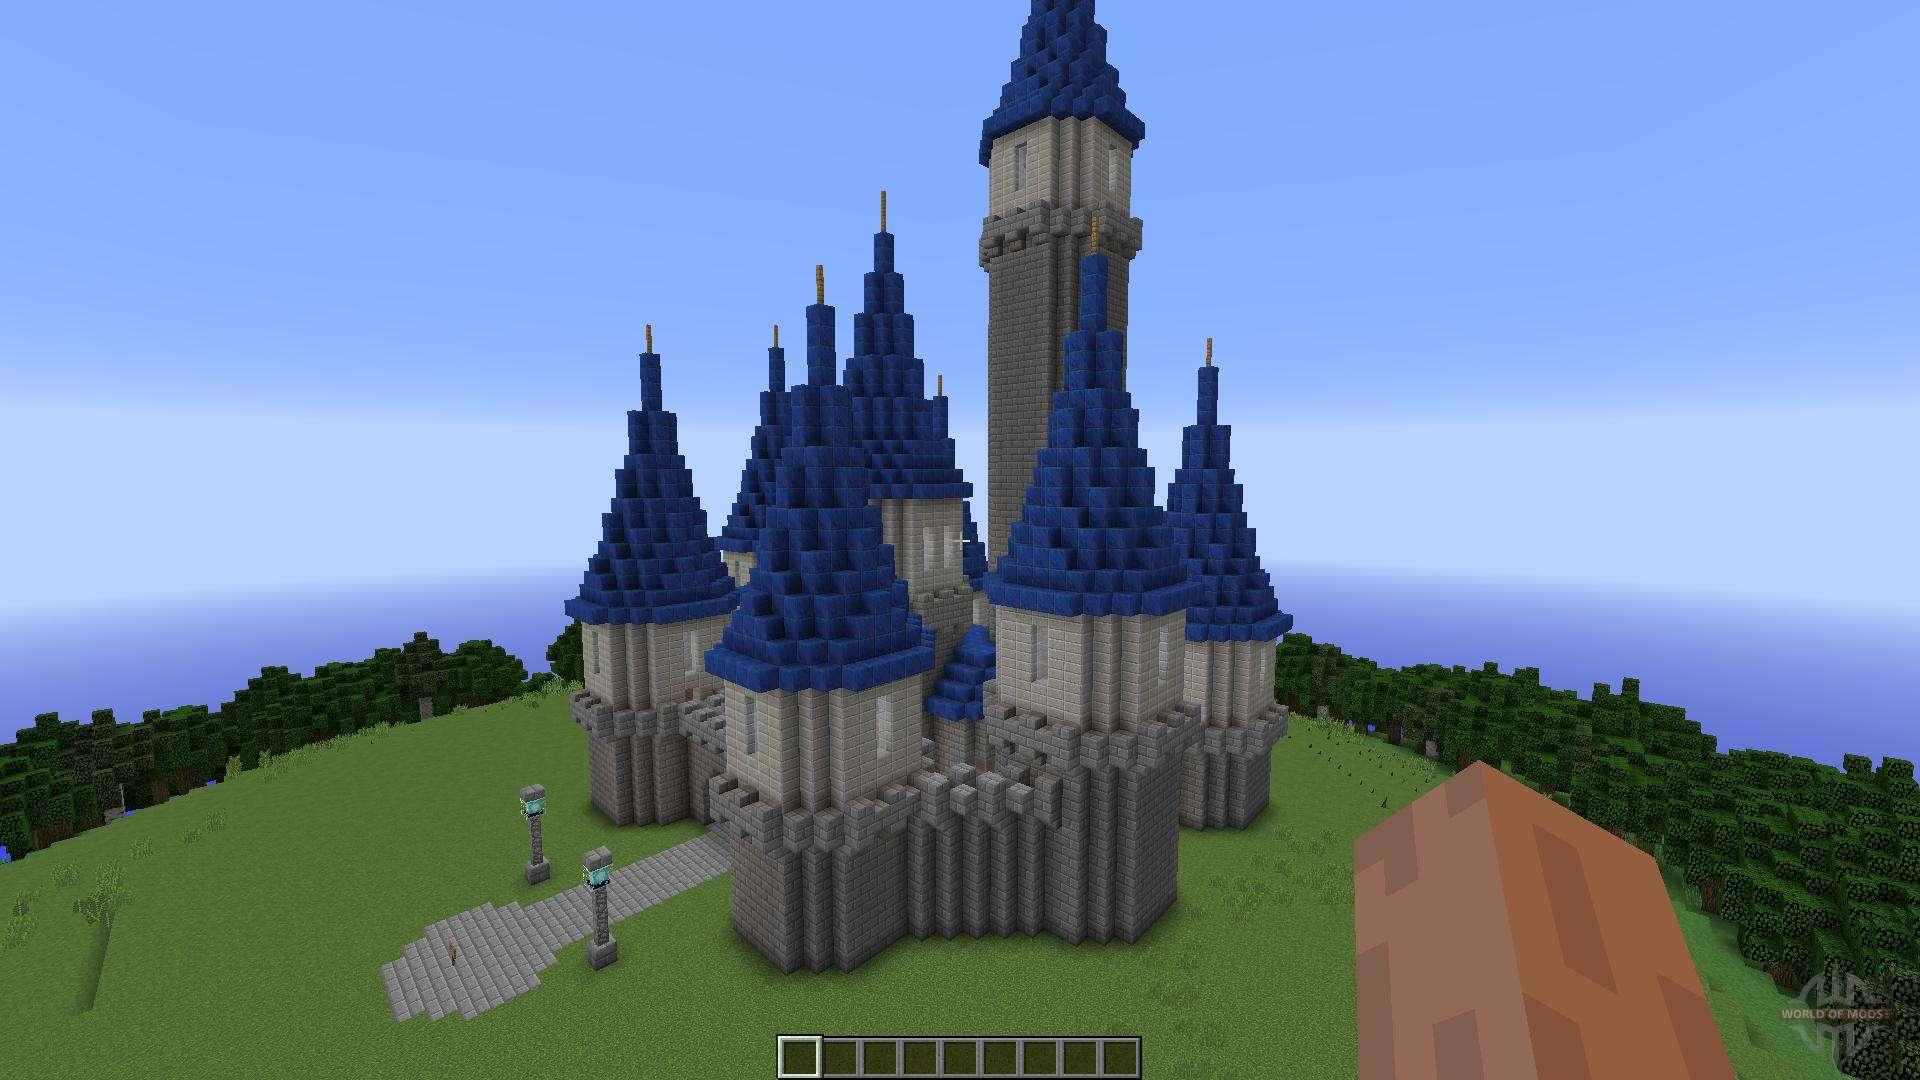 Island castle for minecraft - Chateau de minecraft ...